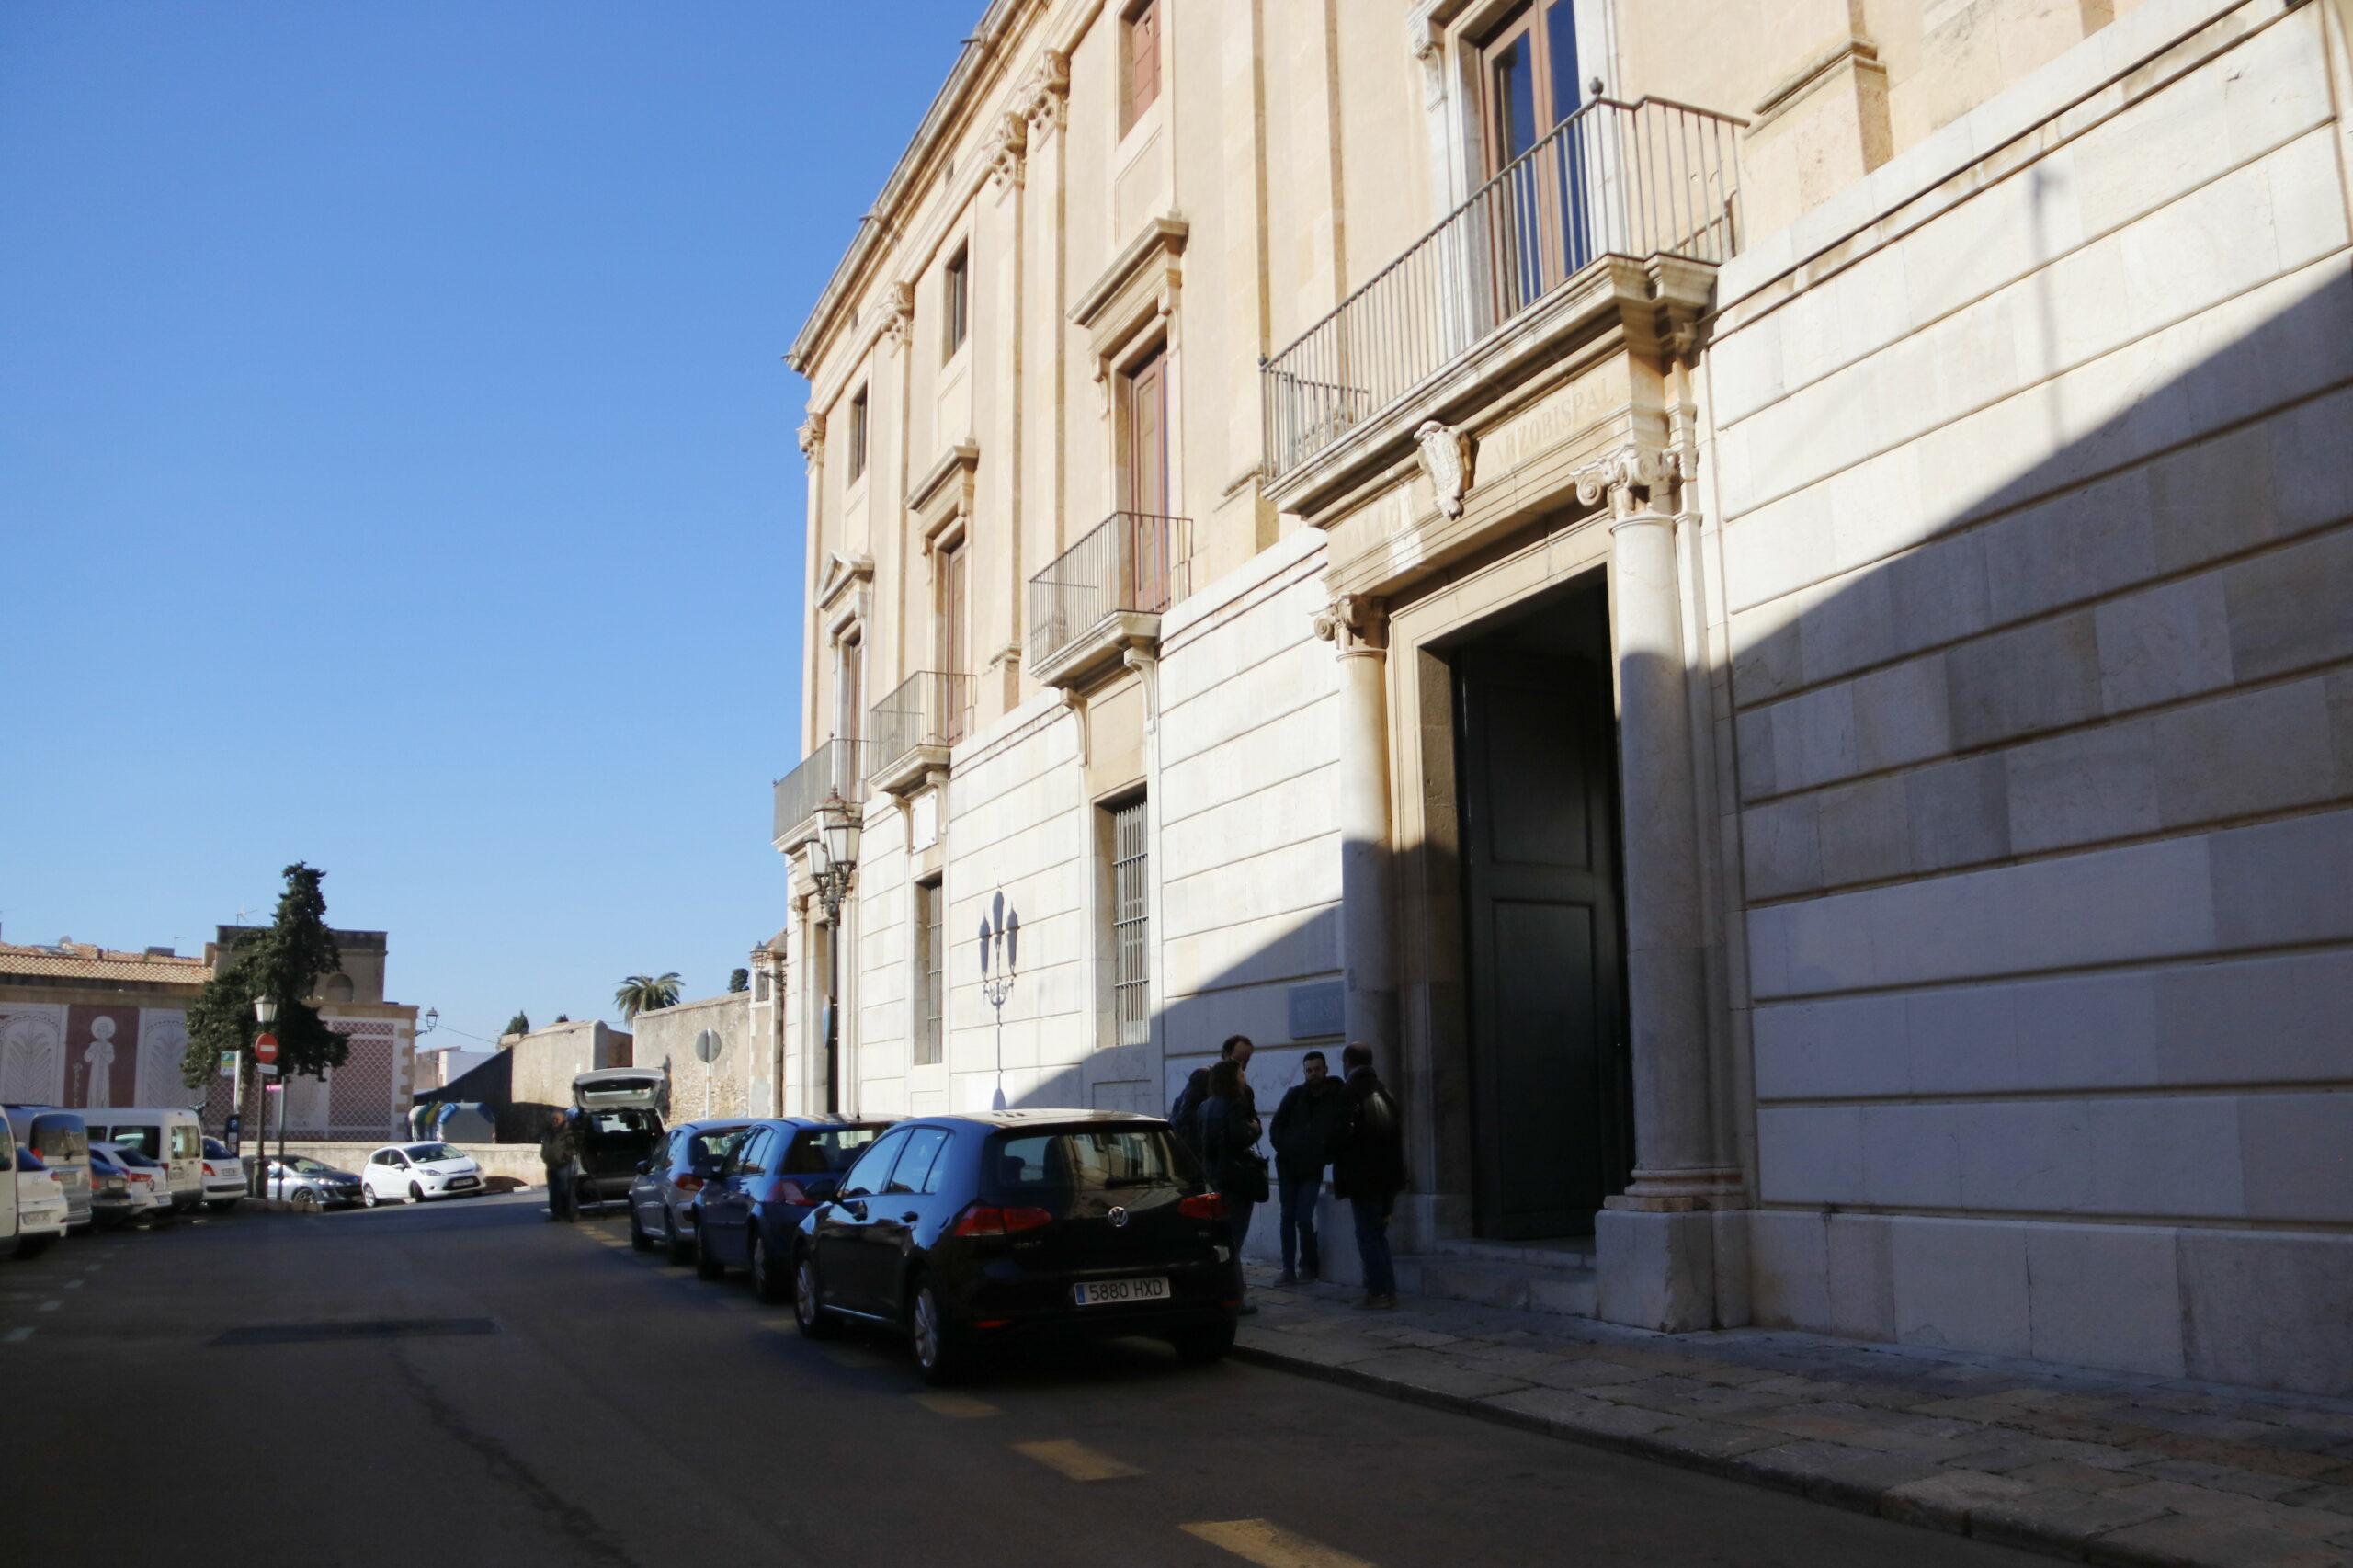 L'arquebisbat de Tarragona | ACN